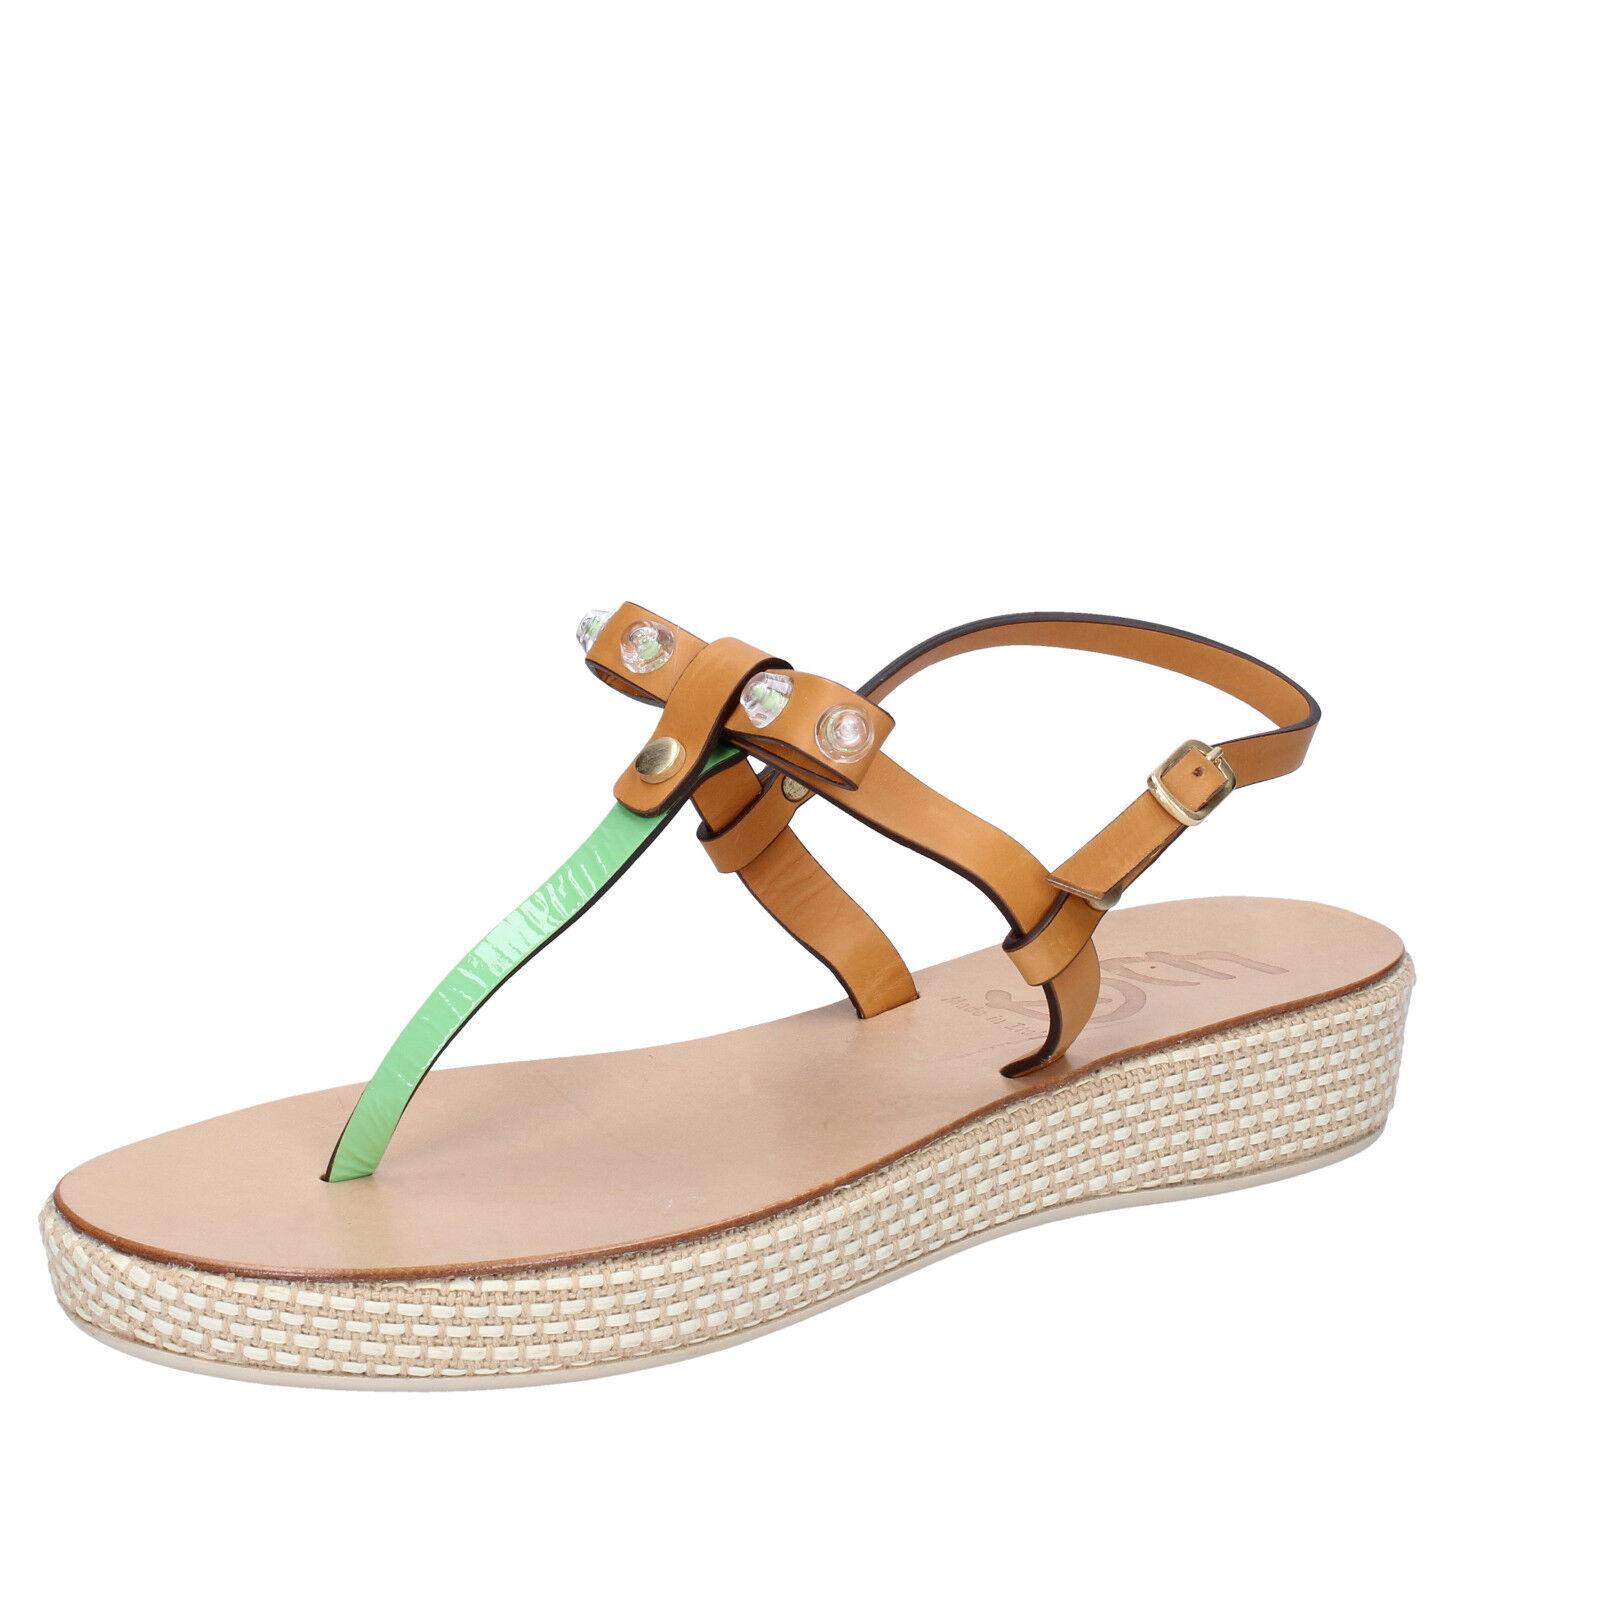 Scarpe donna EDDY DANIELE 37 EU sandali AX772-37 marrone verde pelle vernice AX772-37 sandali b555c6